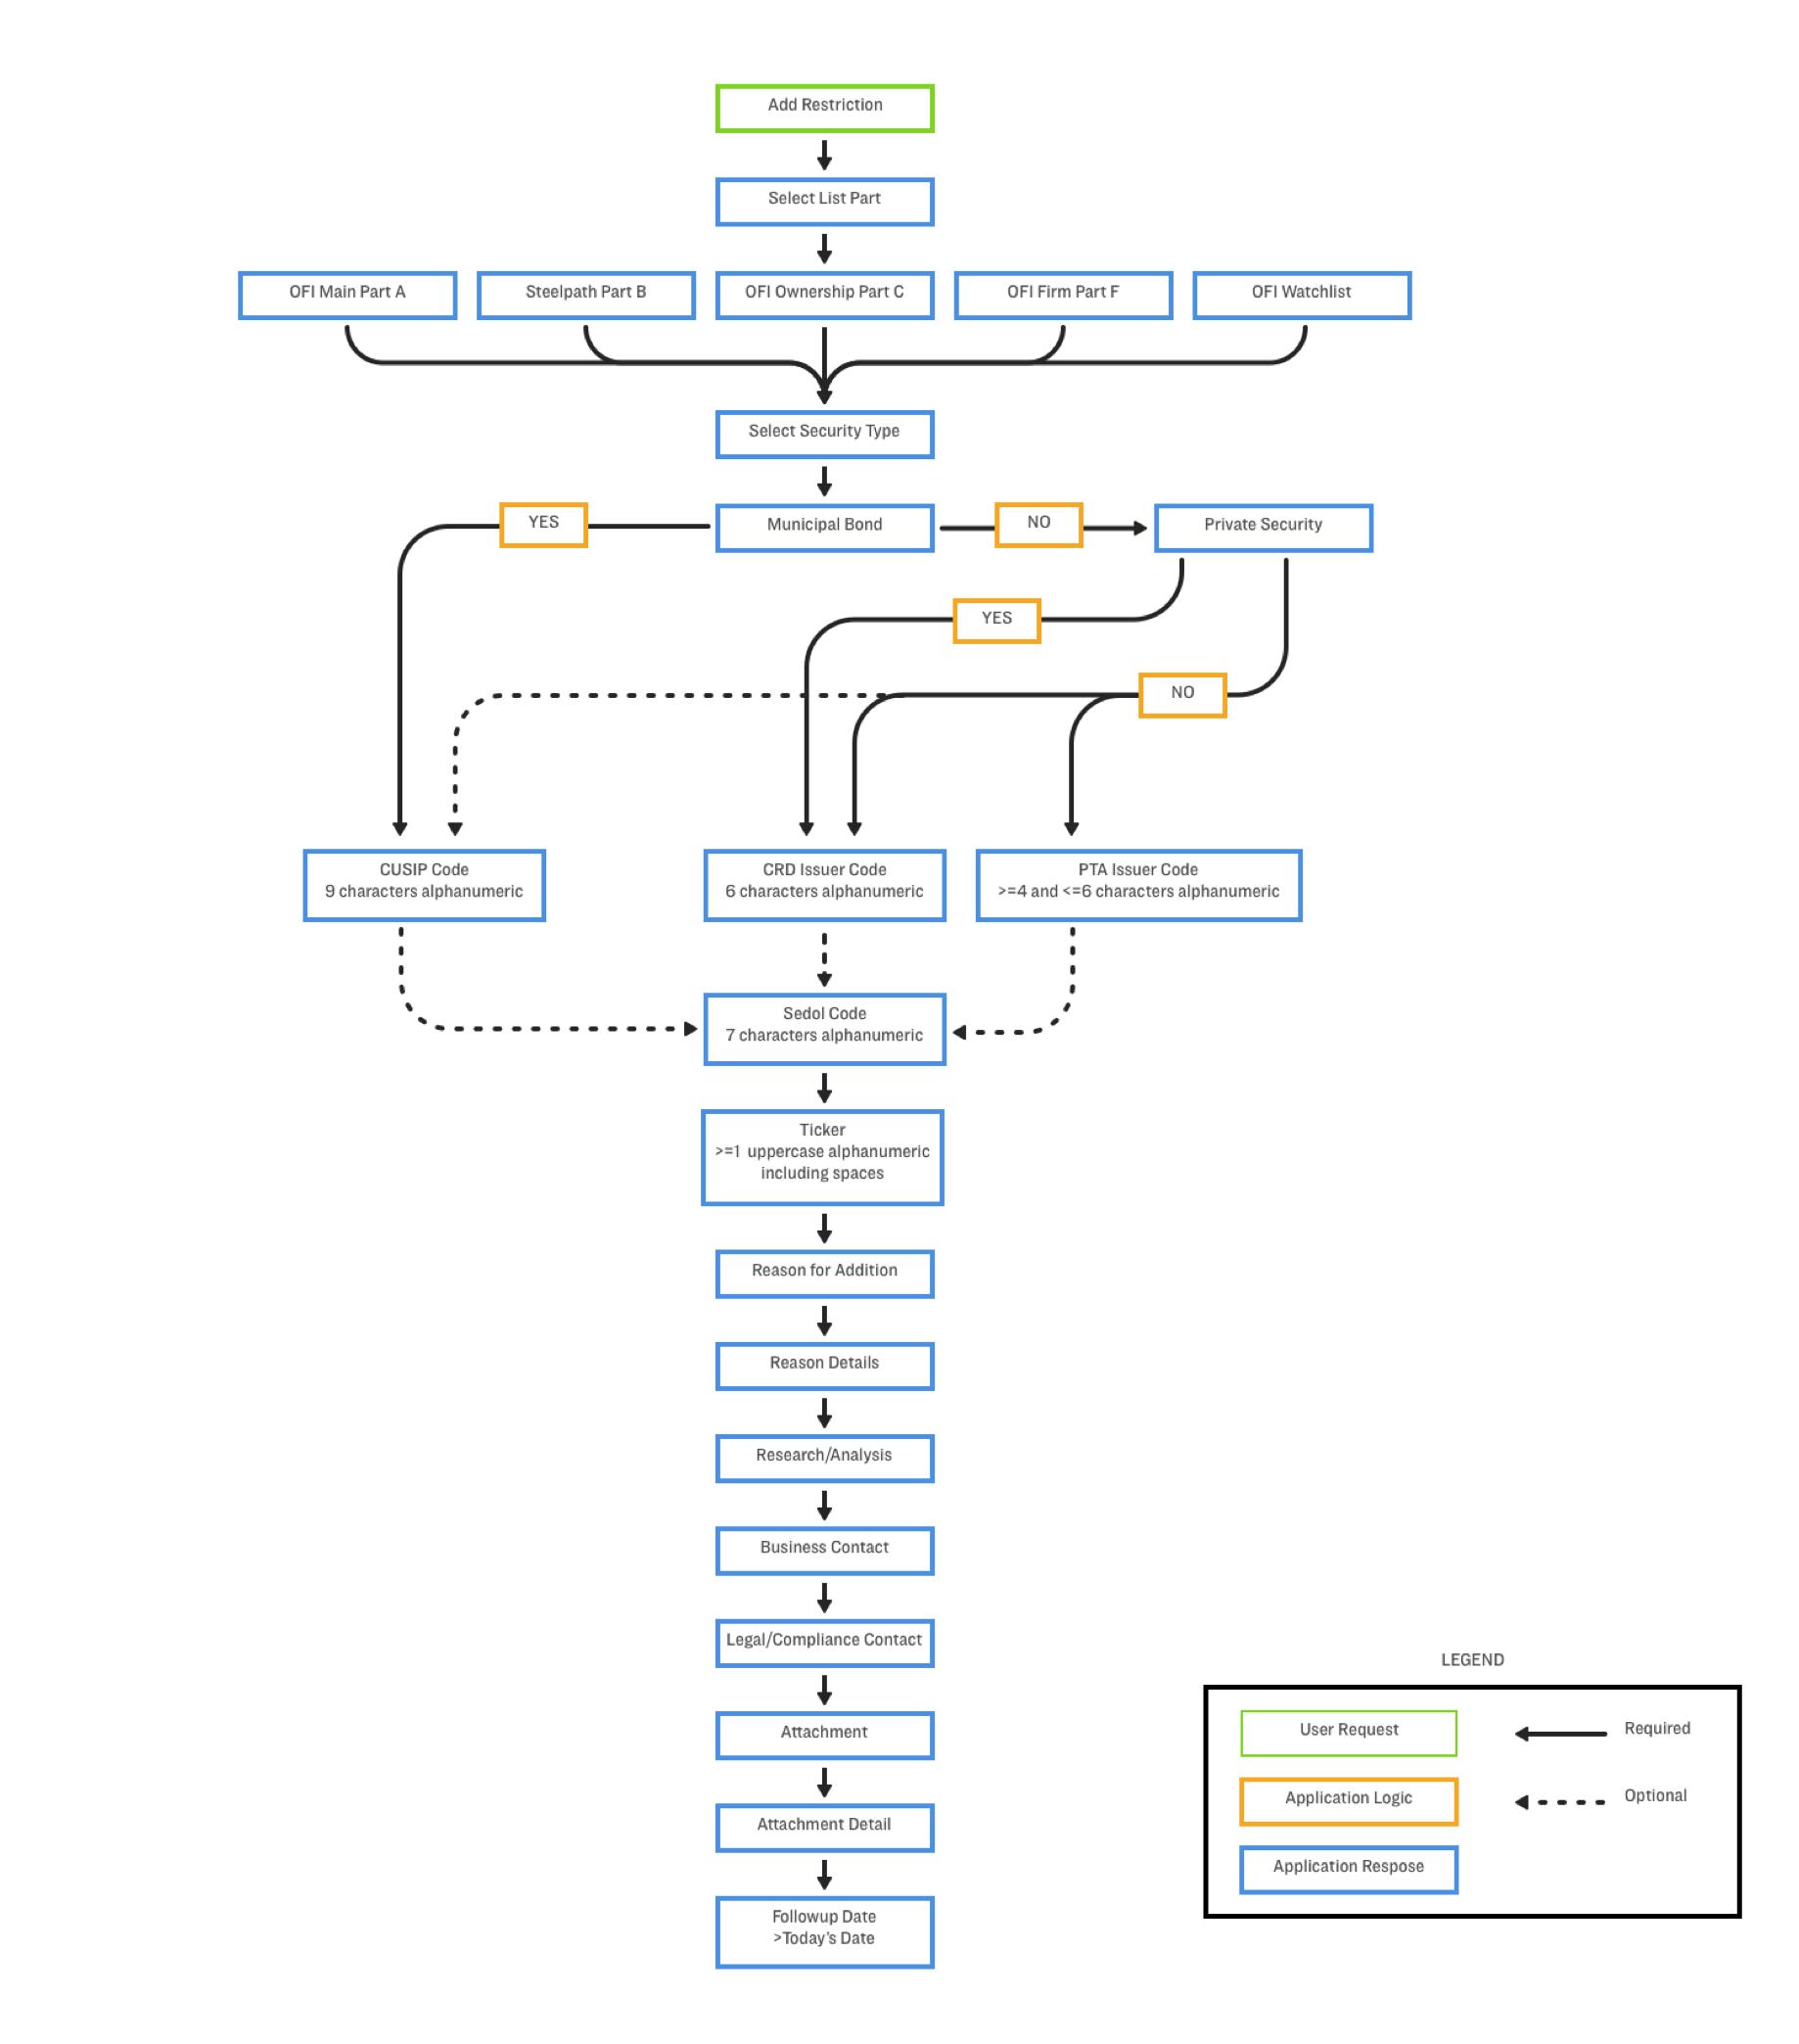 op_logicflow